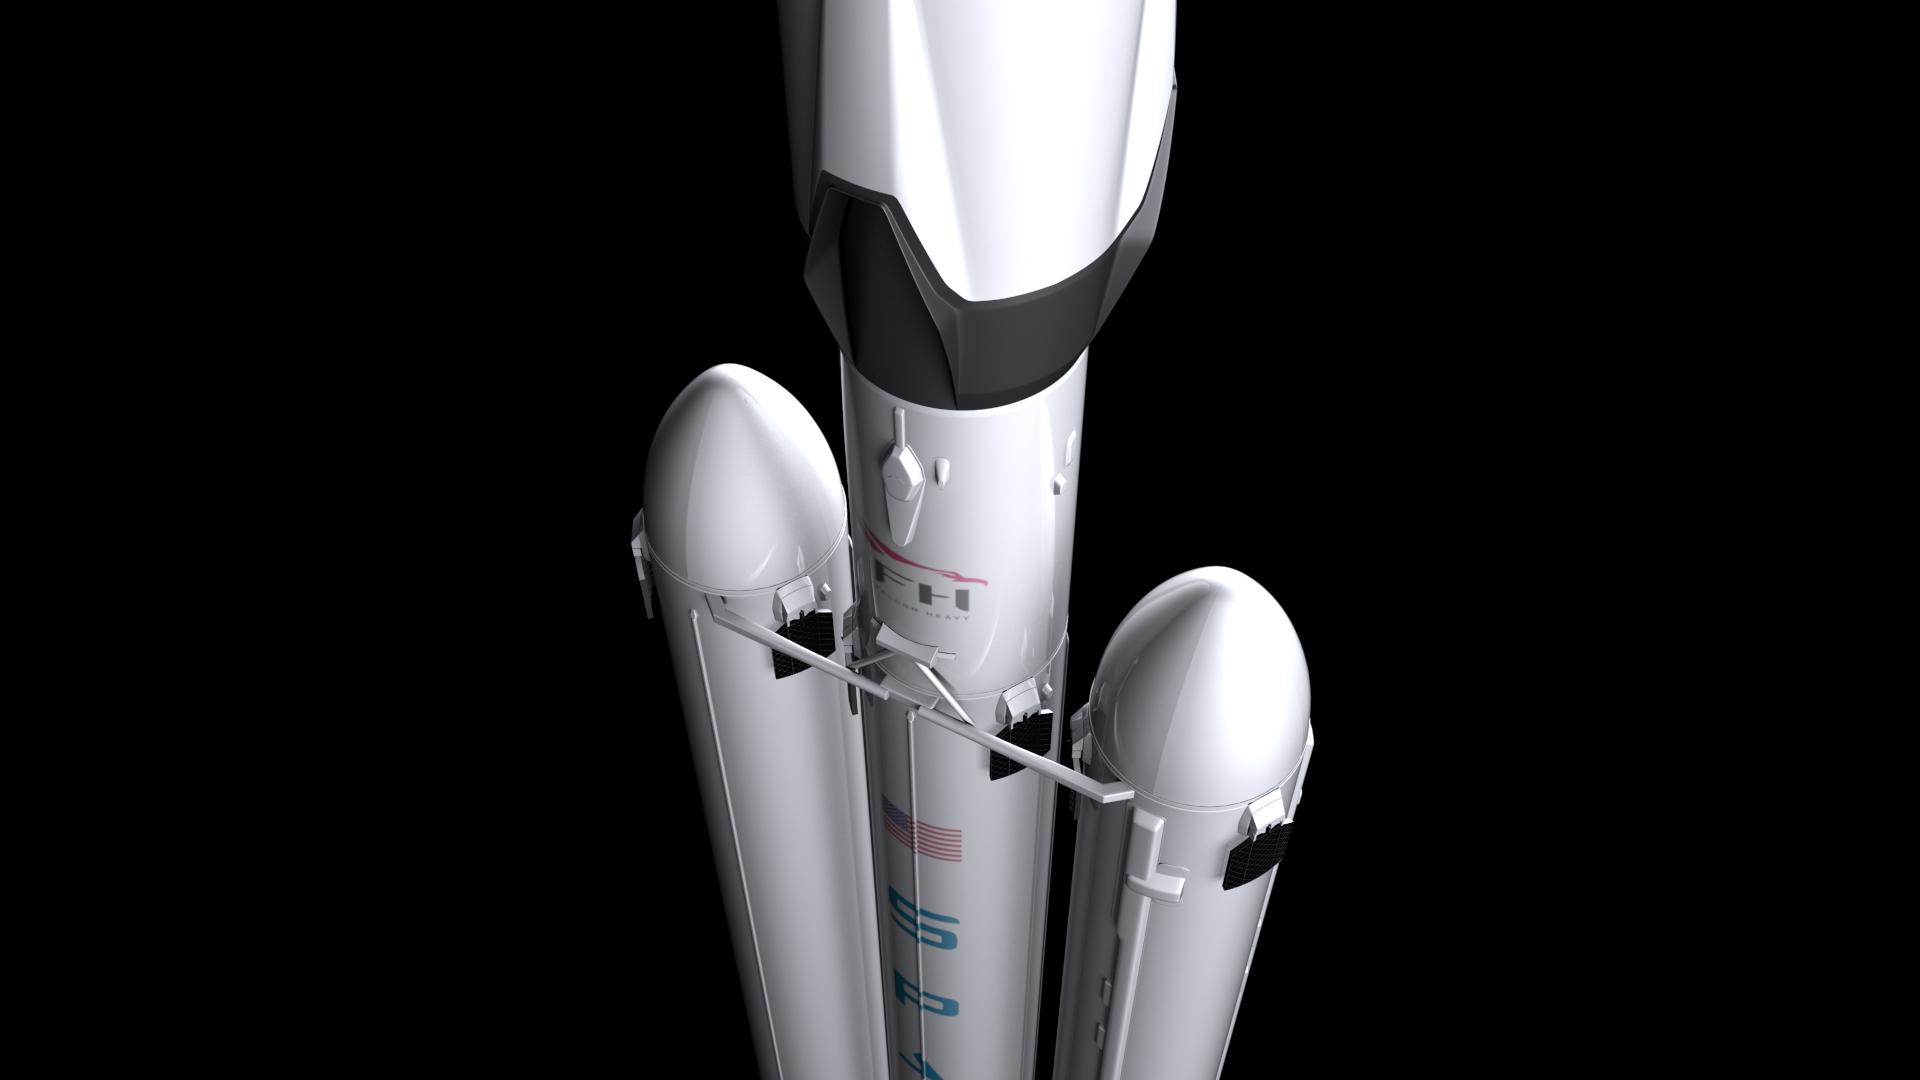 falcon heavy v1.2 fully reusable 3d model max fbx c4d lwo ma mb hrc xsi obj 277858